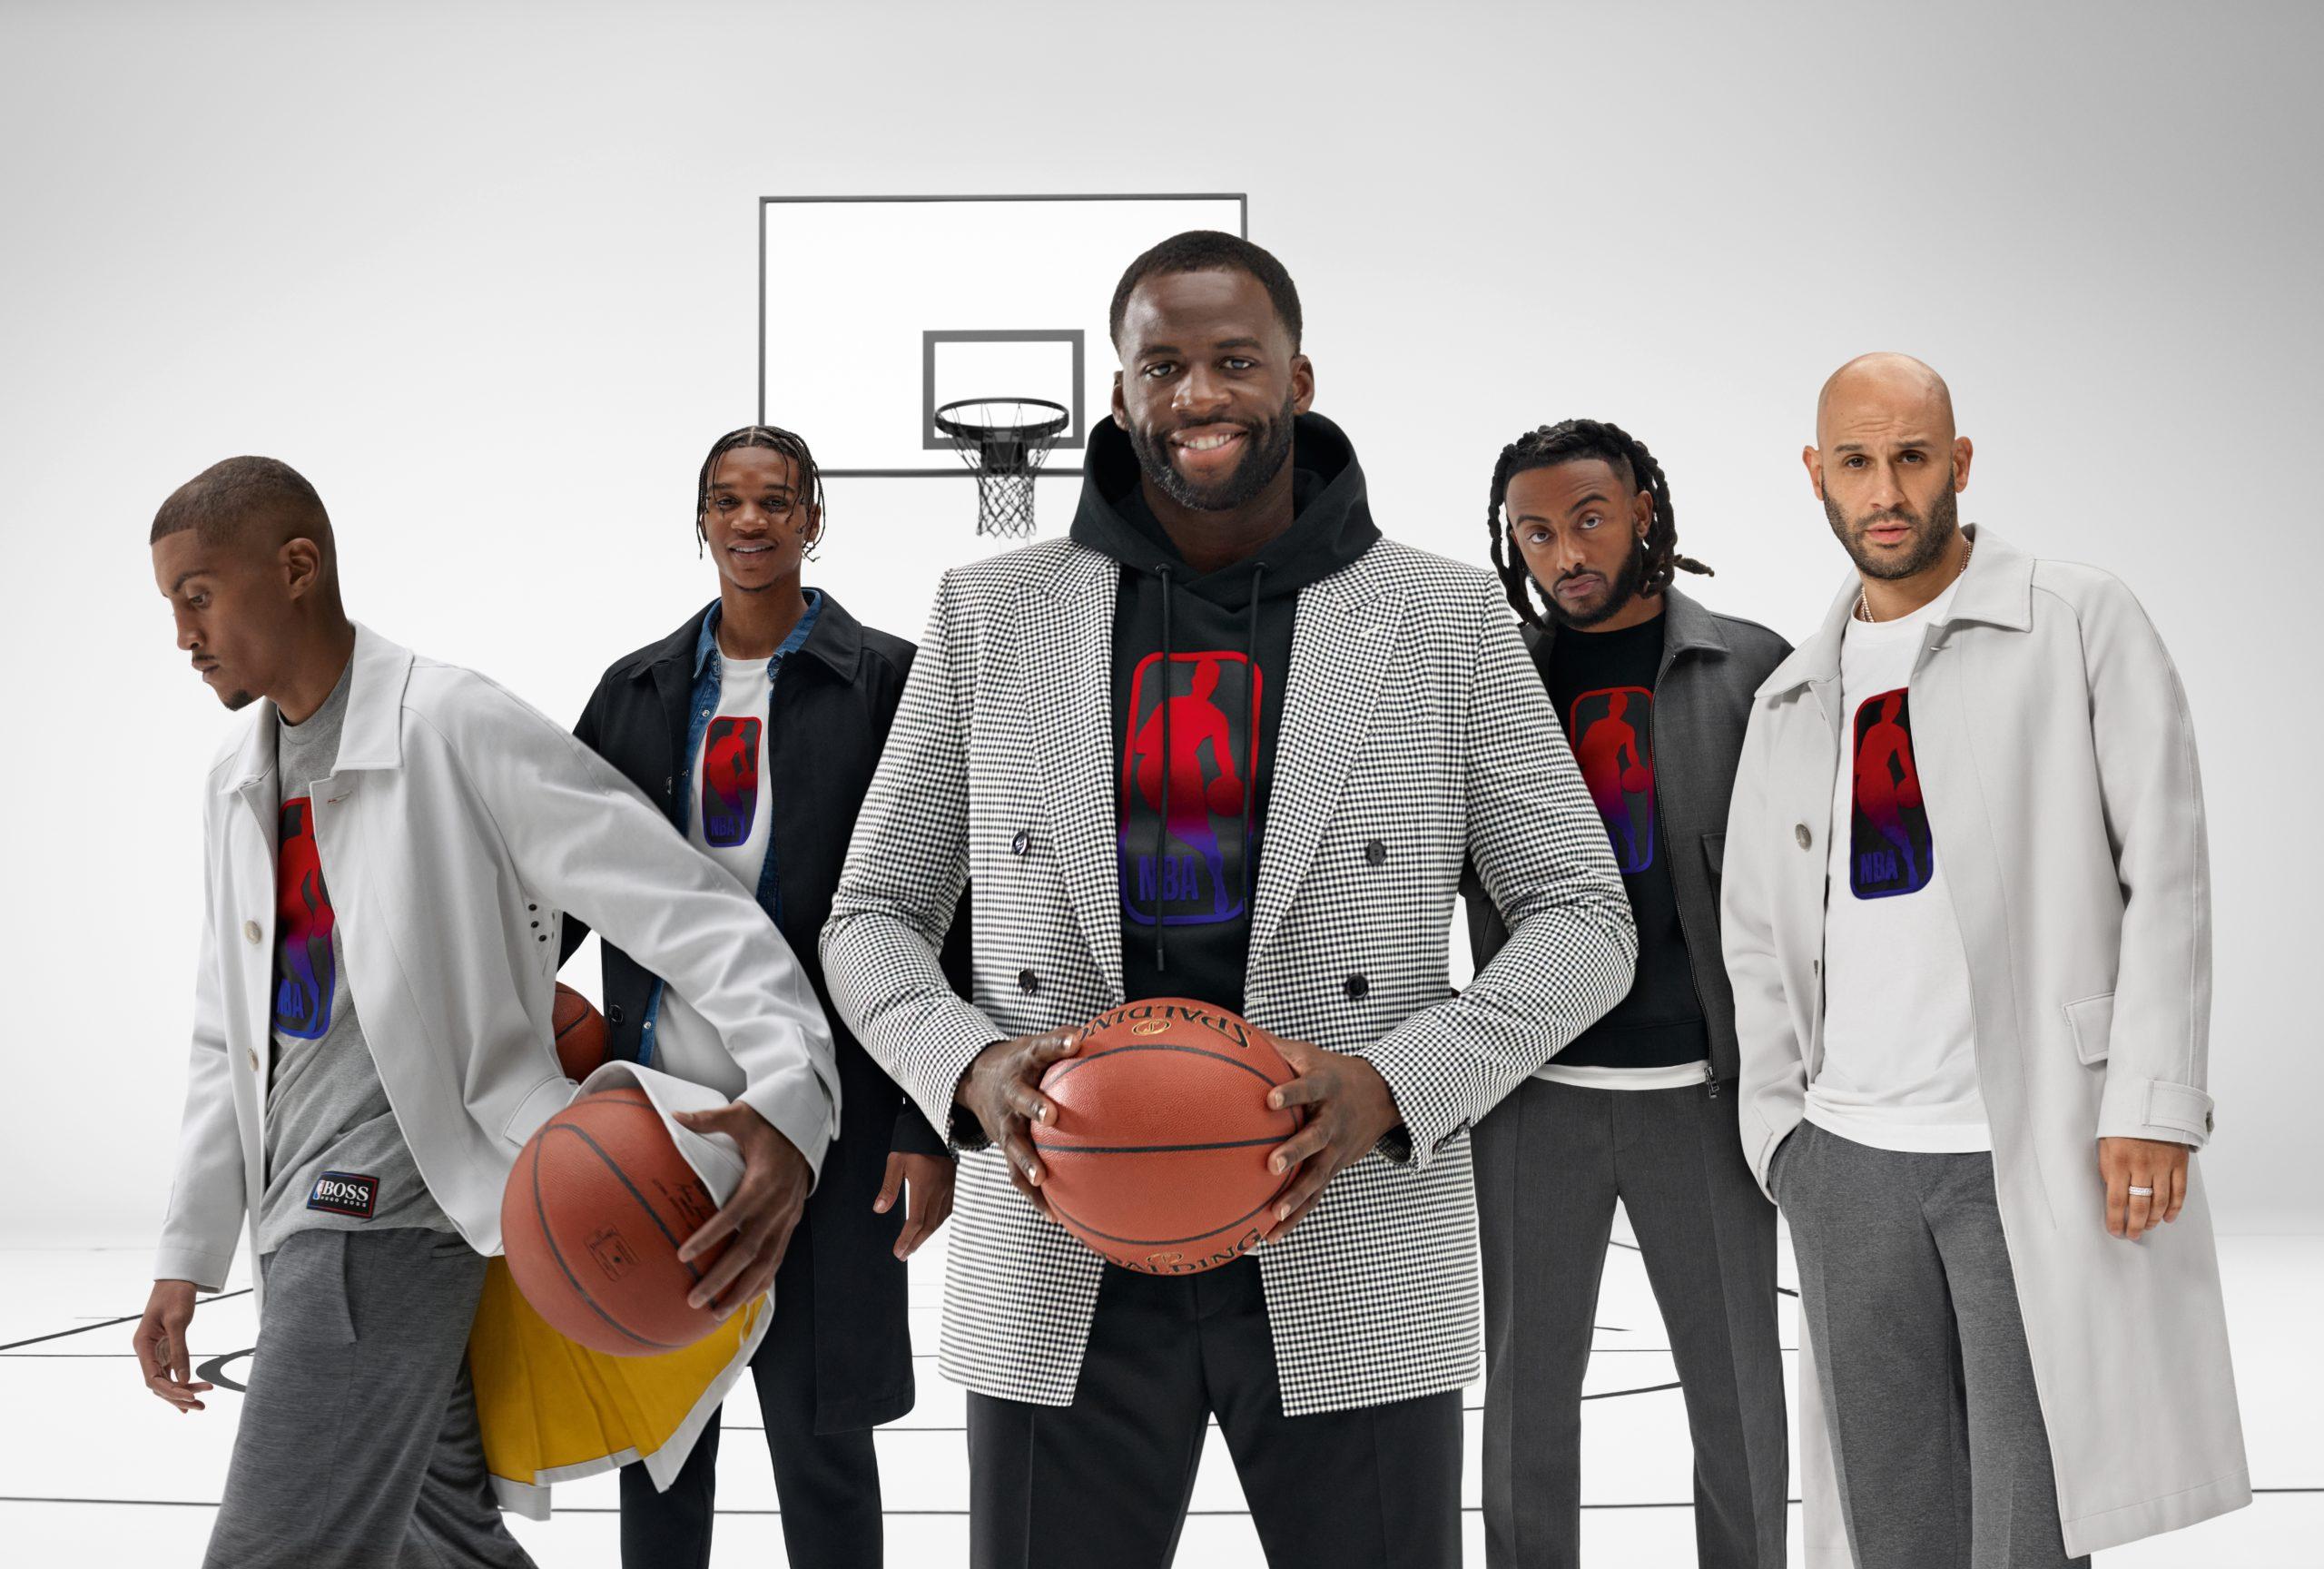 BOSS x NBA - Draymond Green